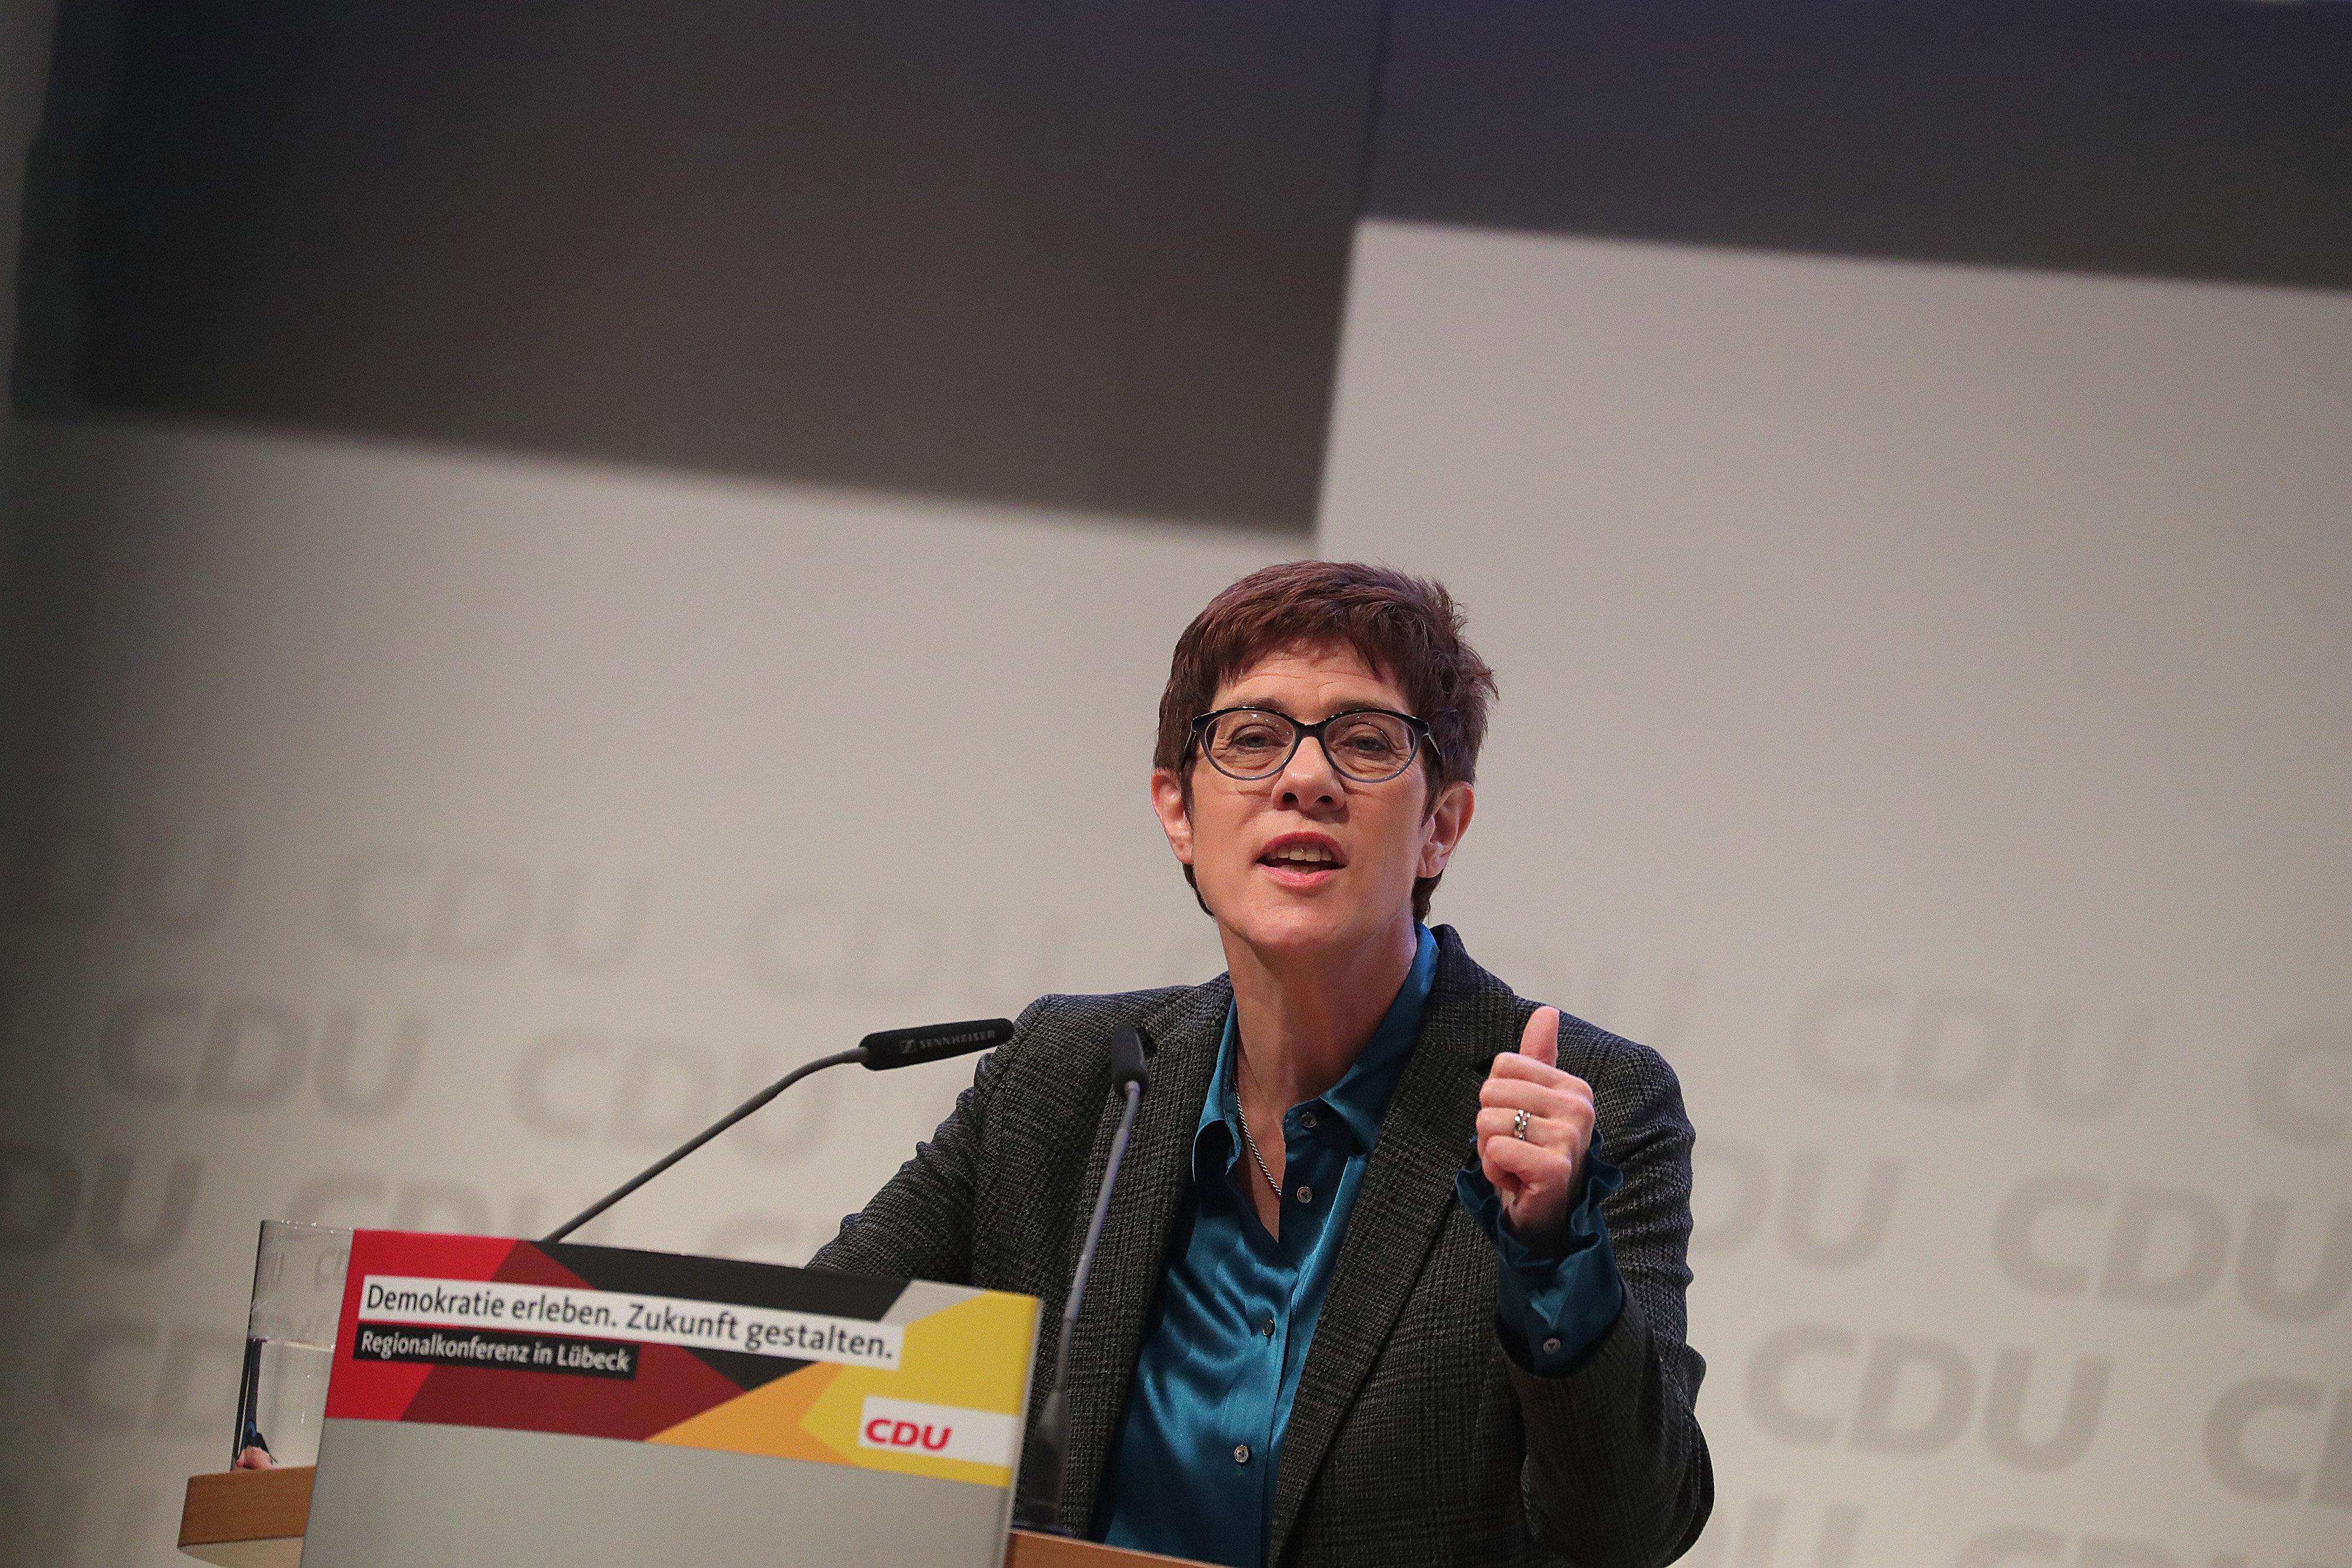 Kampf um CDU-Vorsitz: Kramp-Karrenbauer schickt in Interview Warnung an Konkurrent